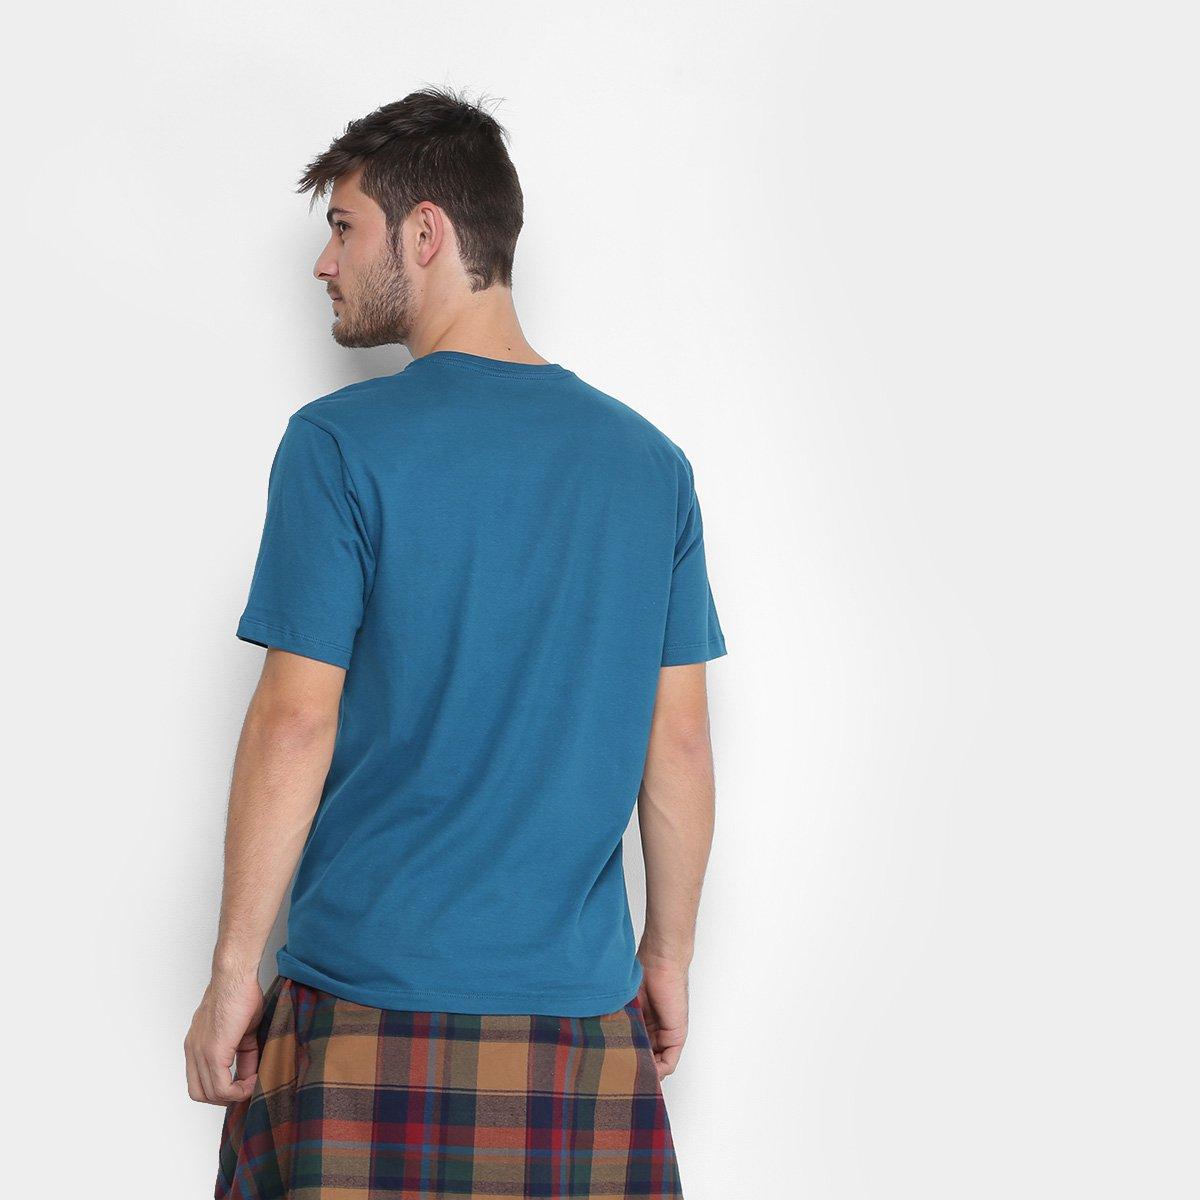 6d3fcd179c Camiseta Hurley Icon Masculina  Camiseta Hurley Icon Masculina ...